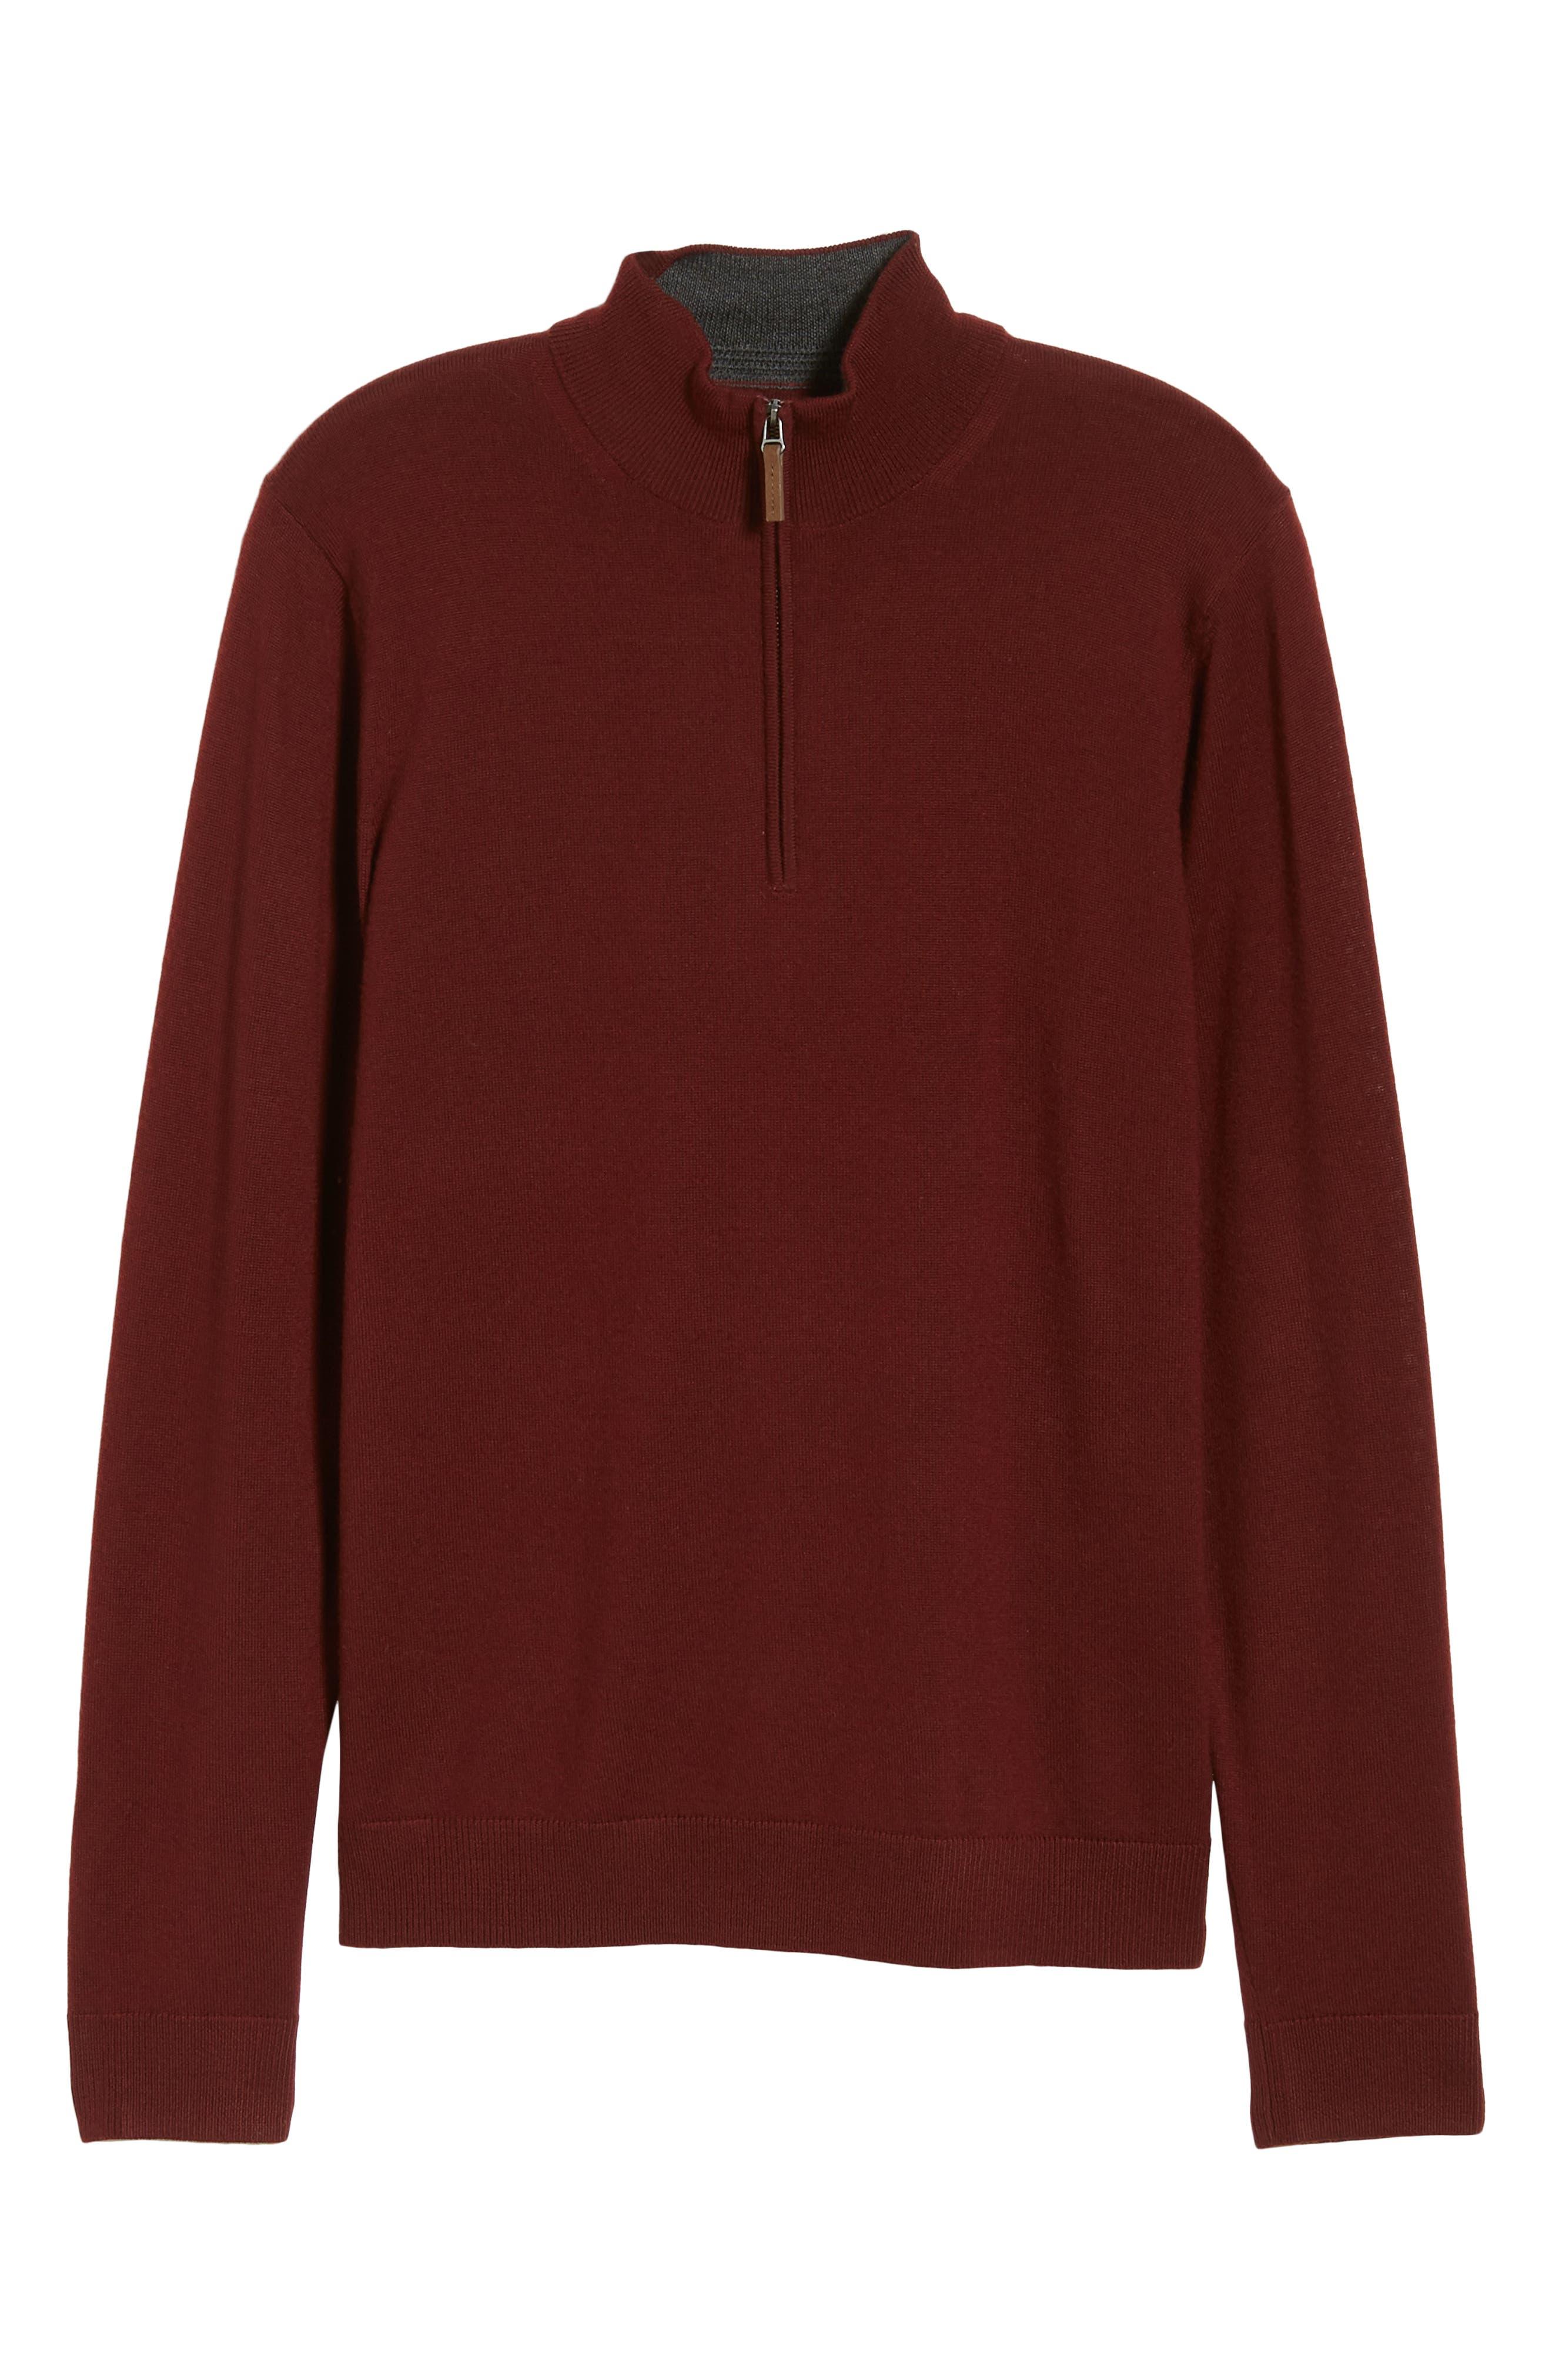 Quarter Zip Wool Pullover,                             Alternate thumbnail 6, color,                             BURGUNDY ROYALE